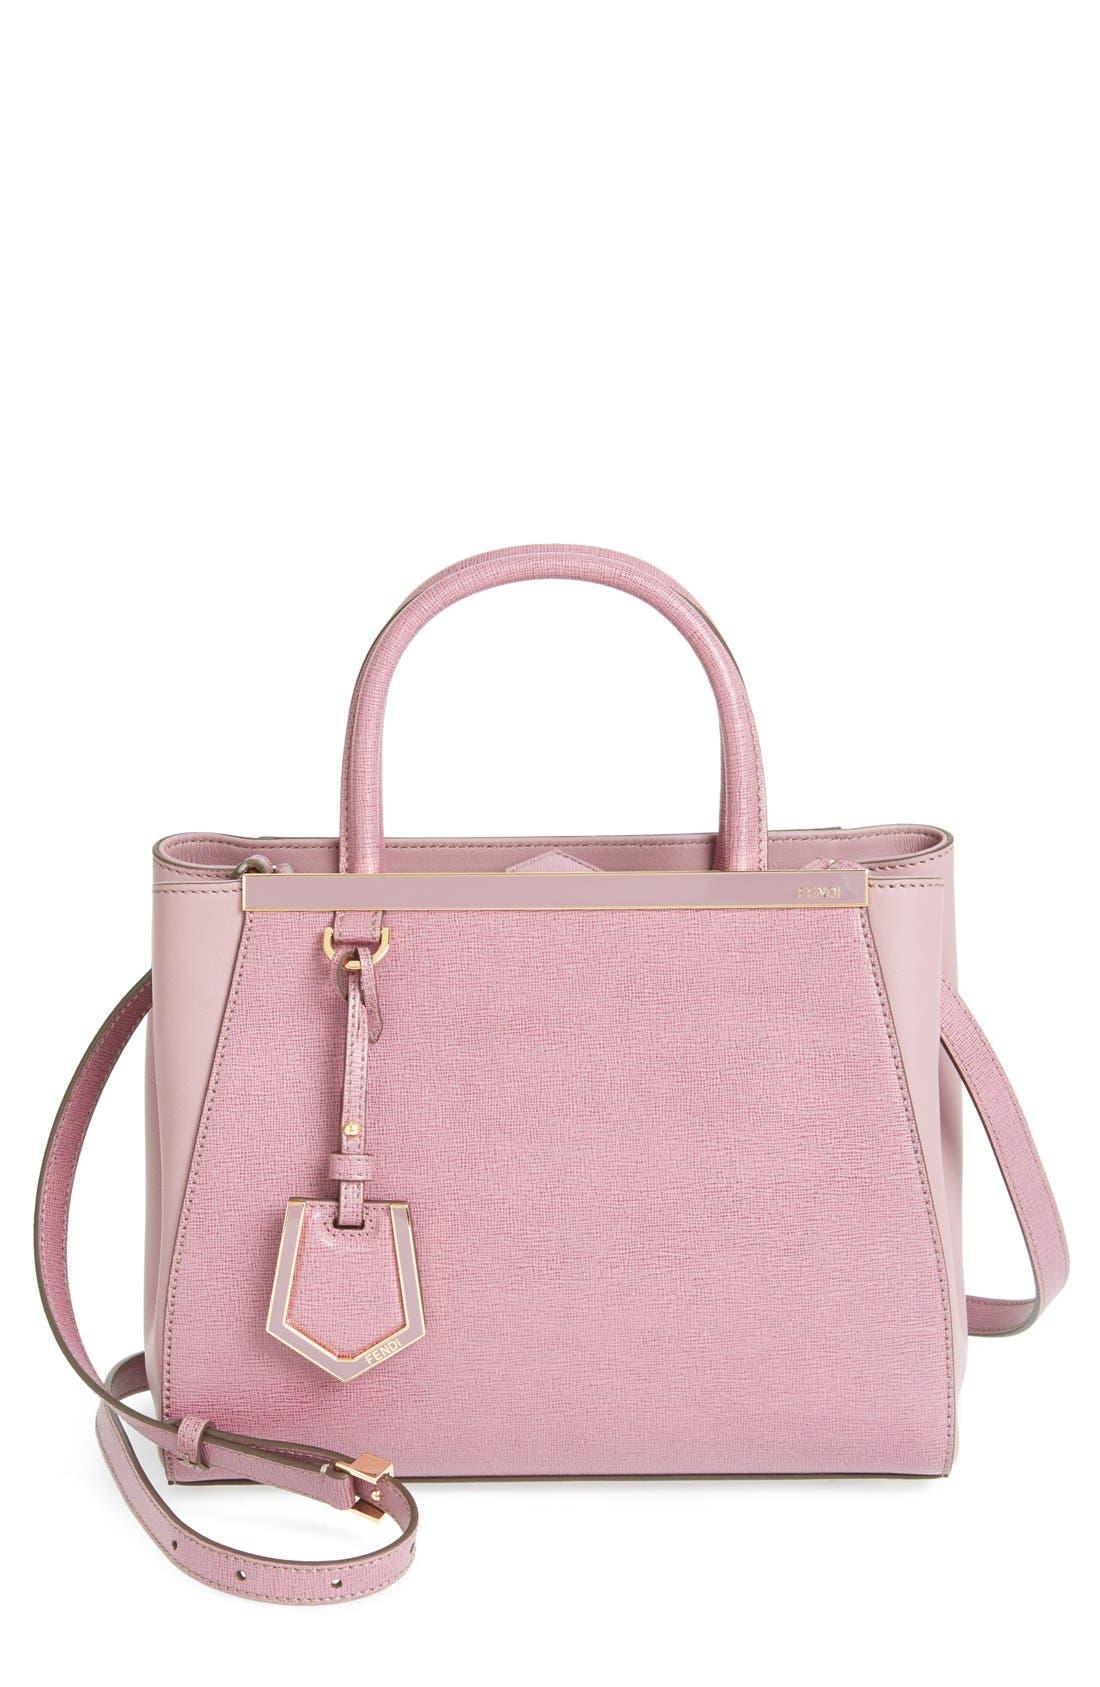 Alternate Image 1 Selected - Fendi 'Petite 2Jours Elite' Leather Shopper